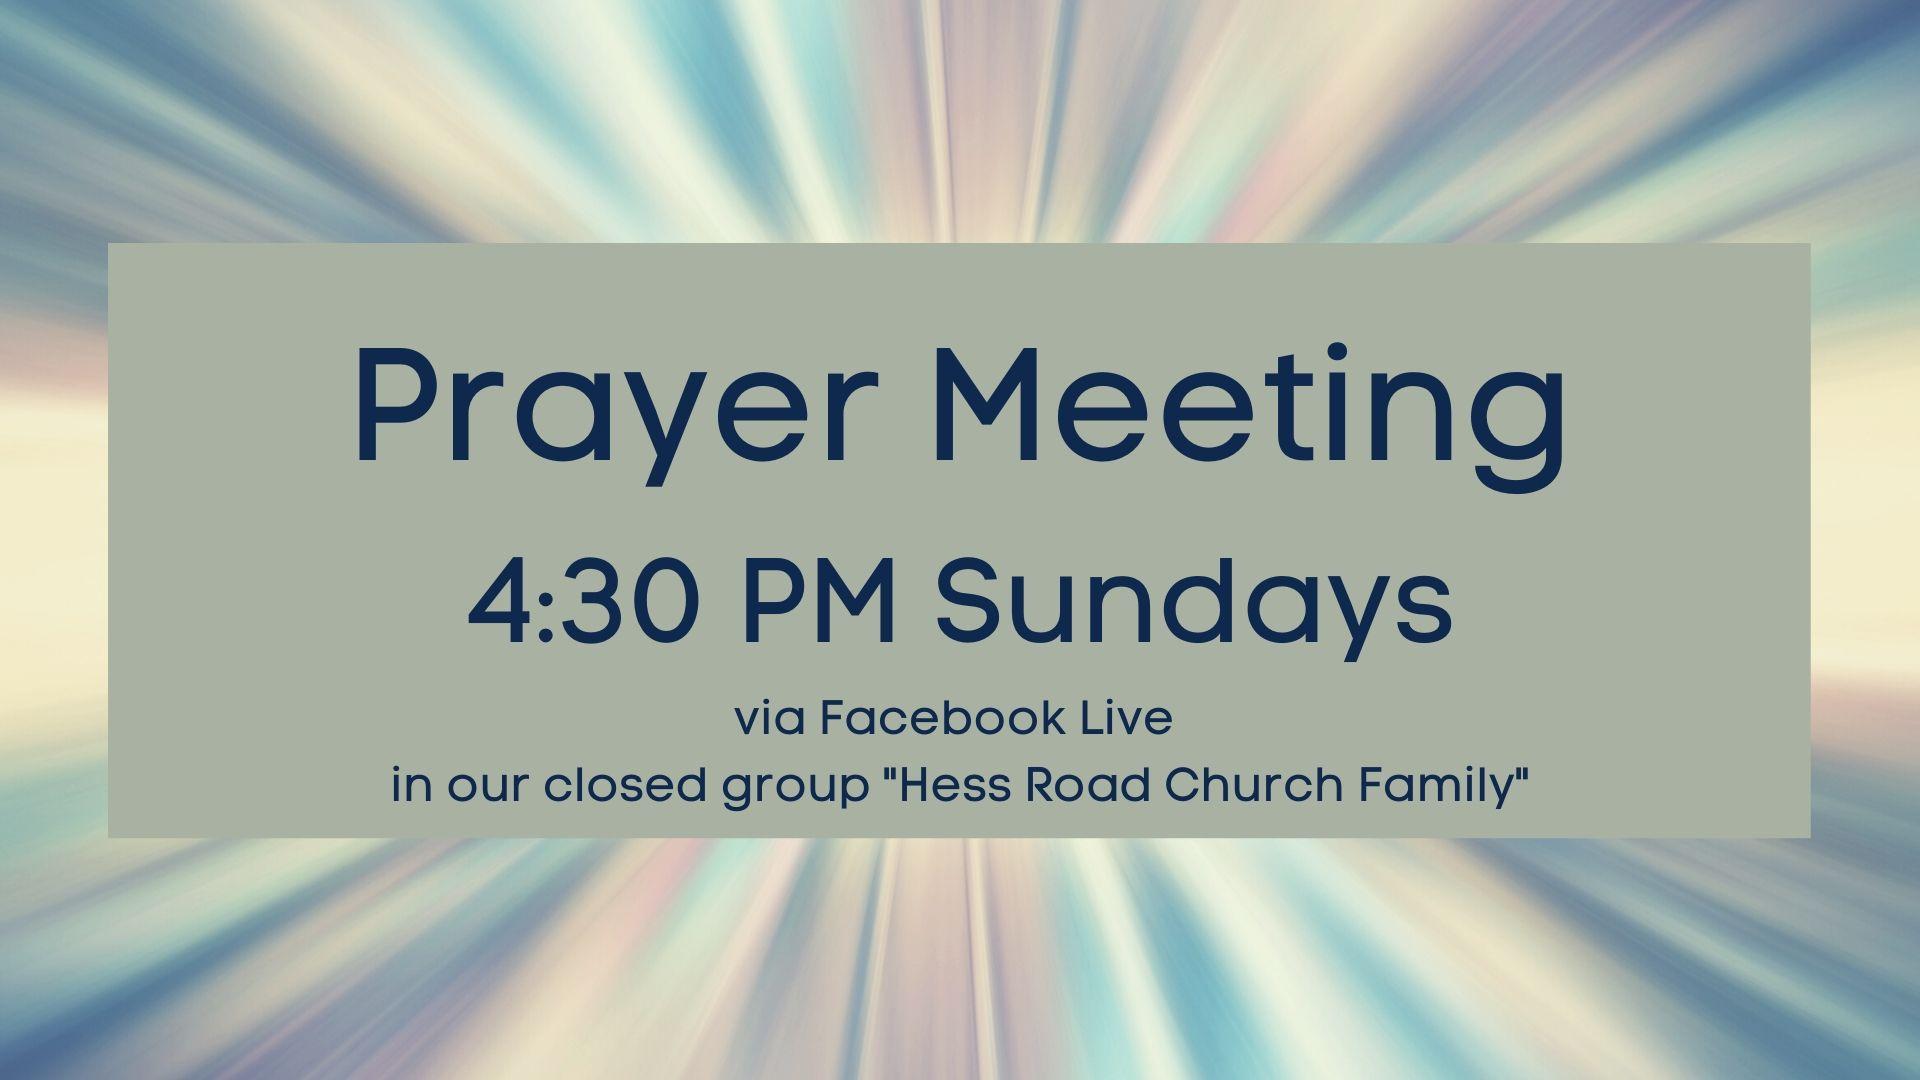 Prayer Meeting 4_30 PM Sundays via Faceb